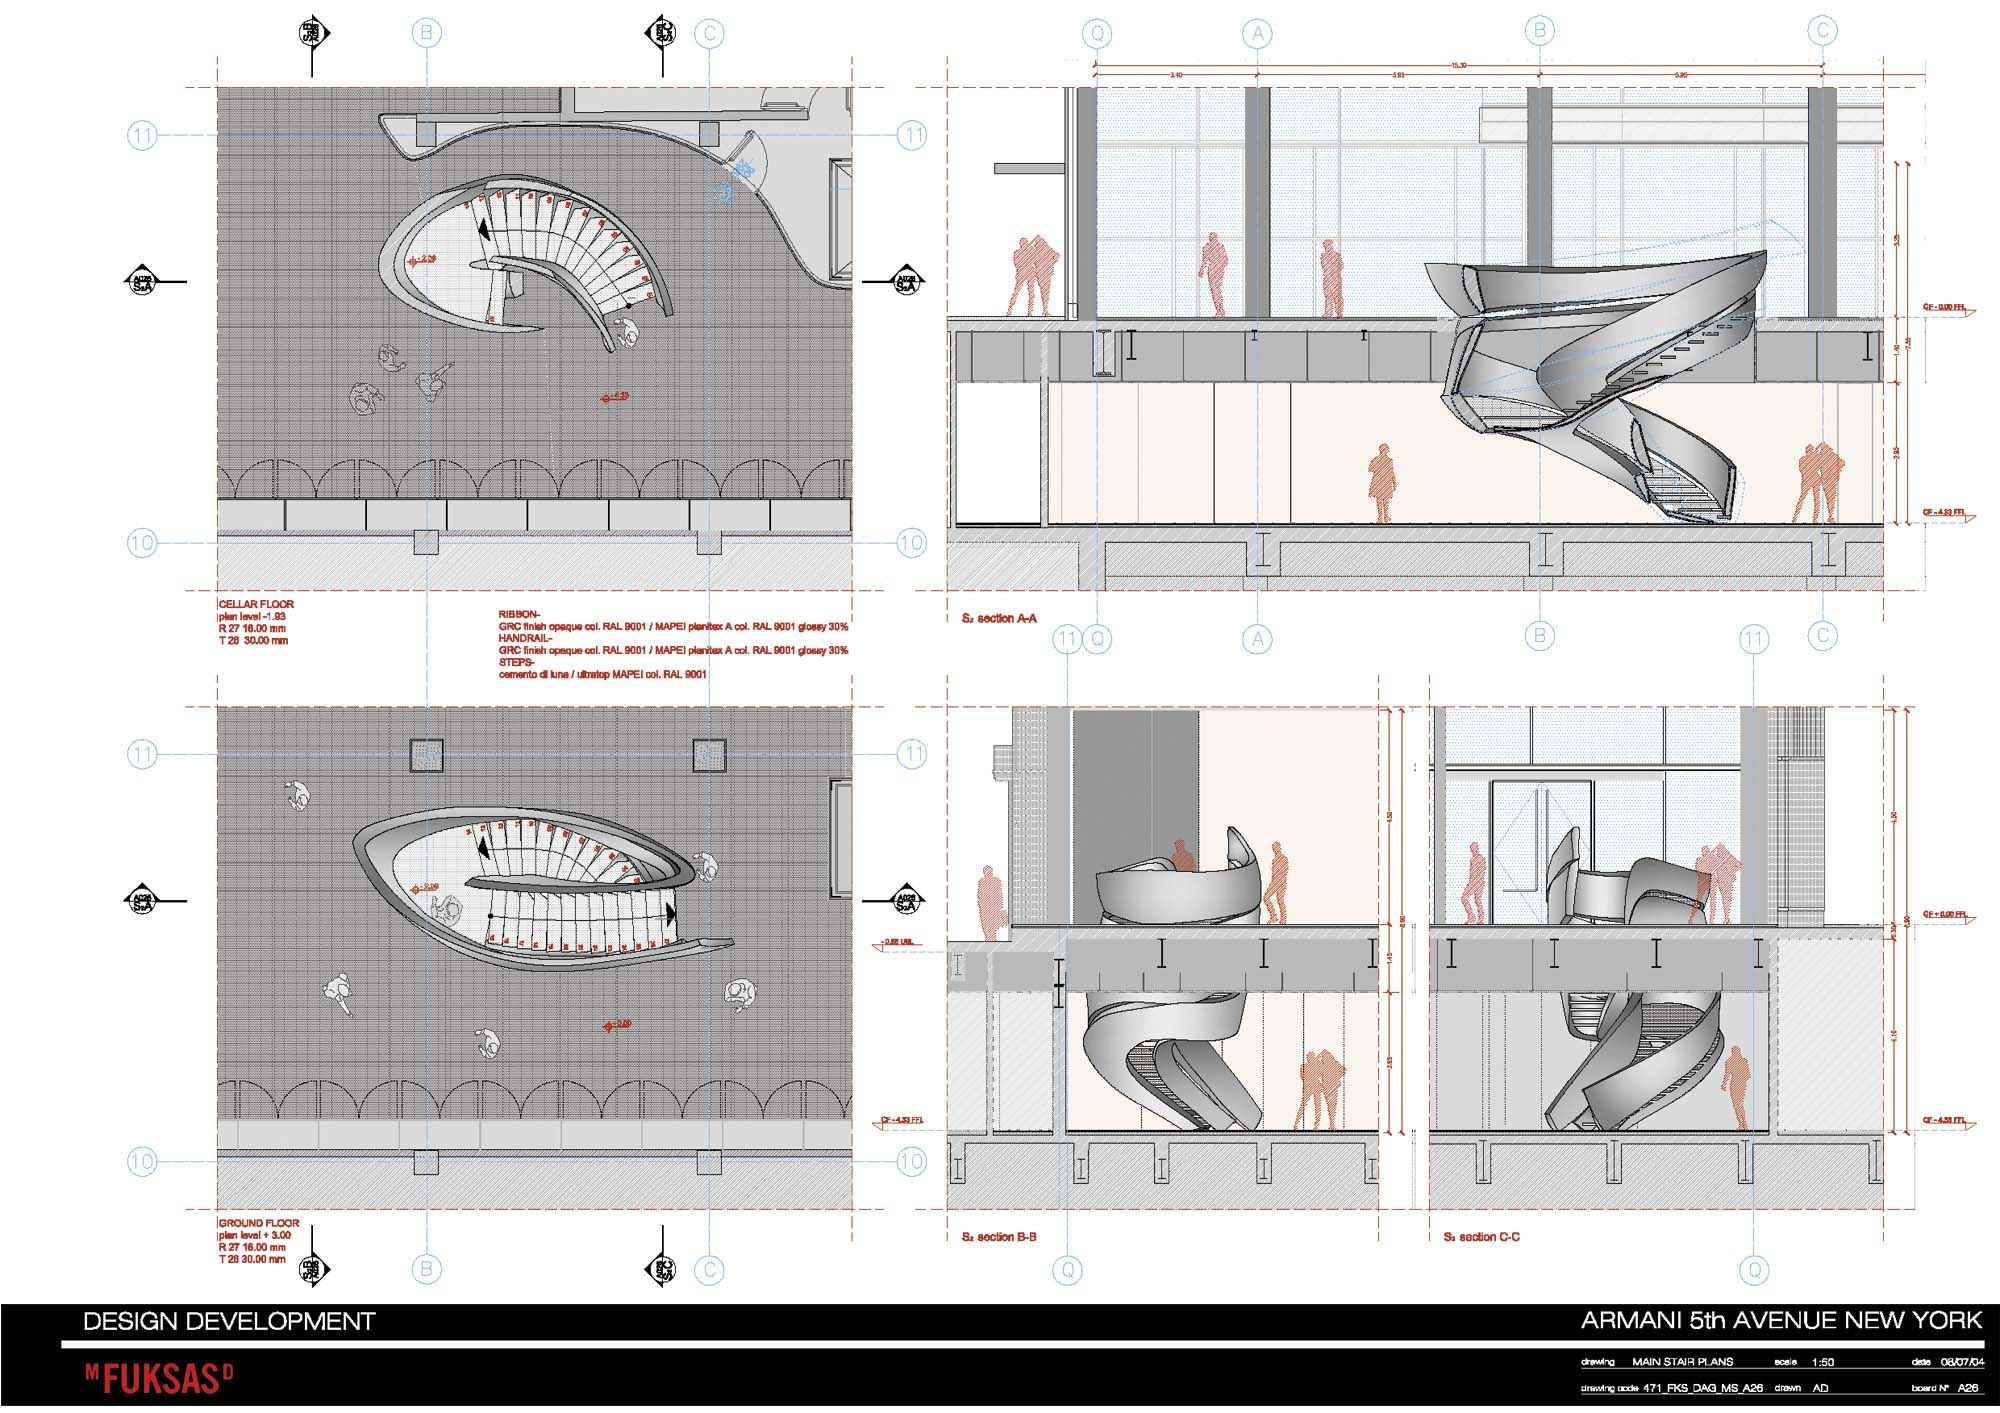 armani fifth ave massimiliano doriana fuksas stair. Black Bedroom Furniture Sets. Home Design Ideas